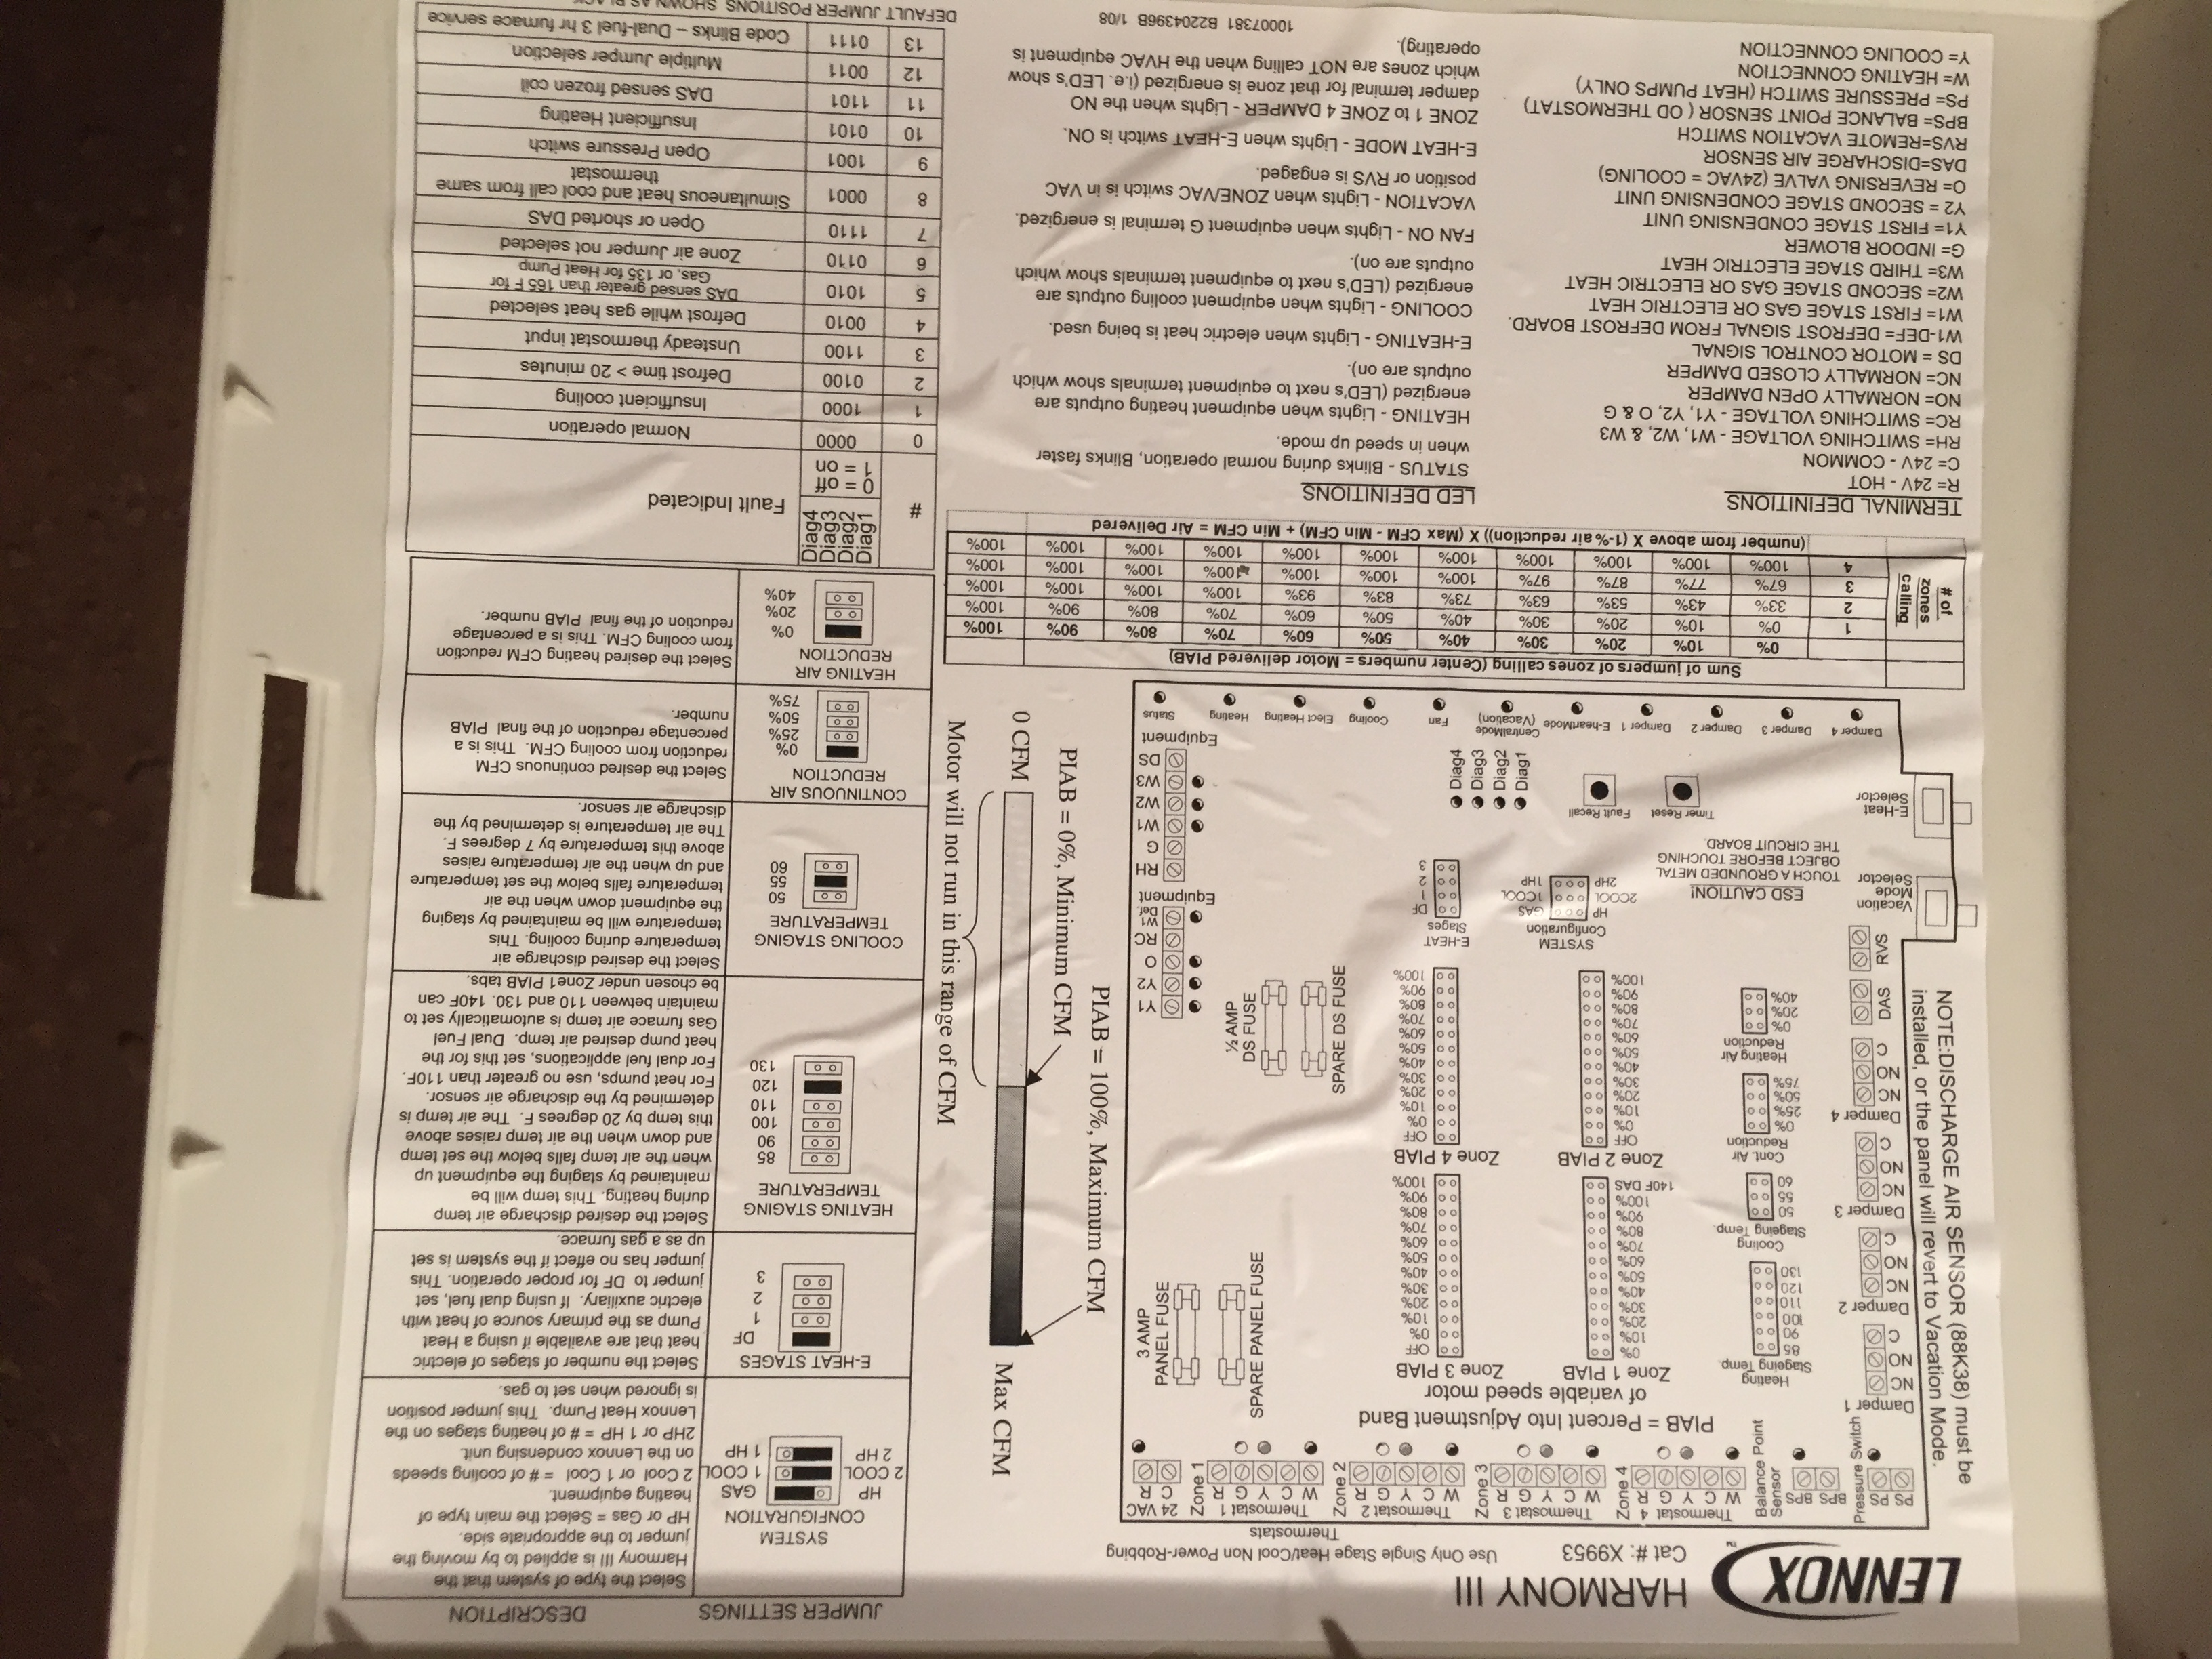 I have a Lennox SLP98V furnace a XC21 AC unit and a 3